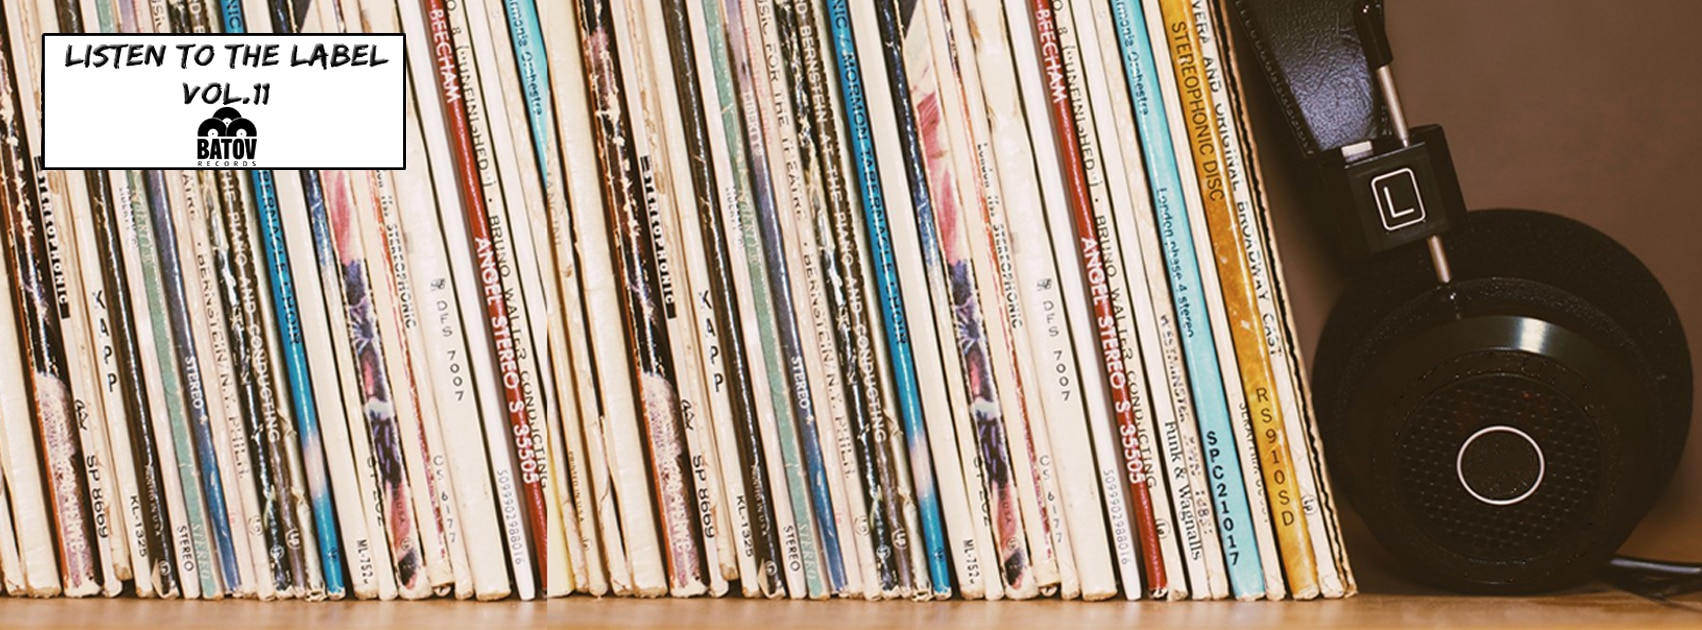 Listen to World Music Labels